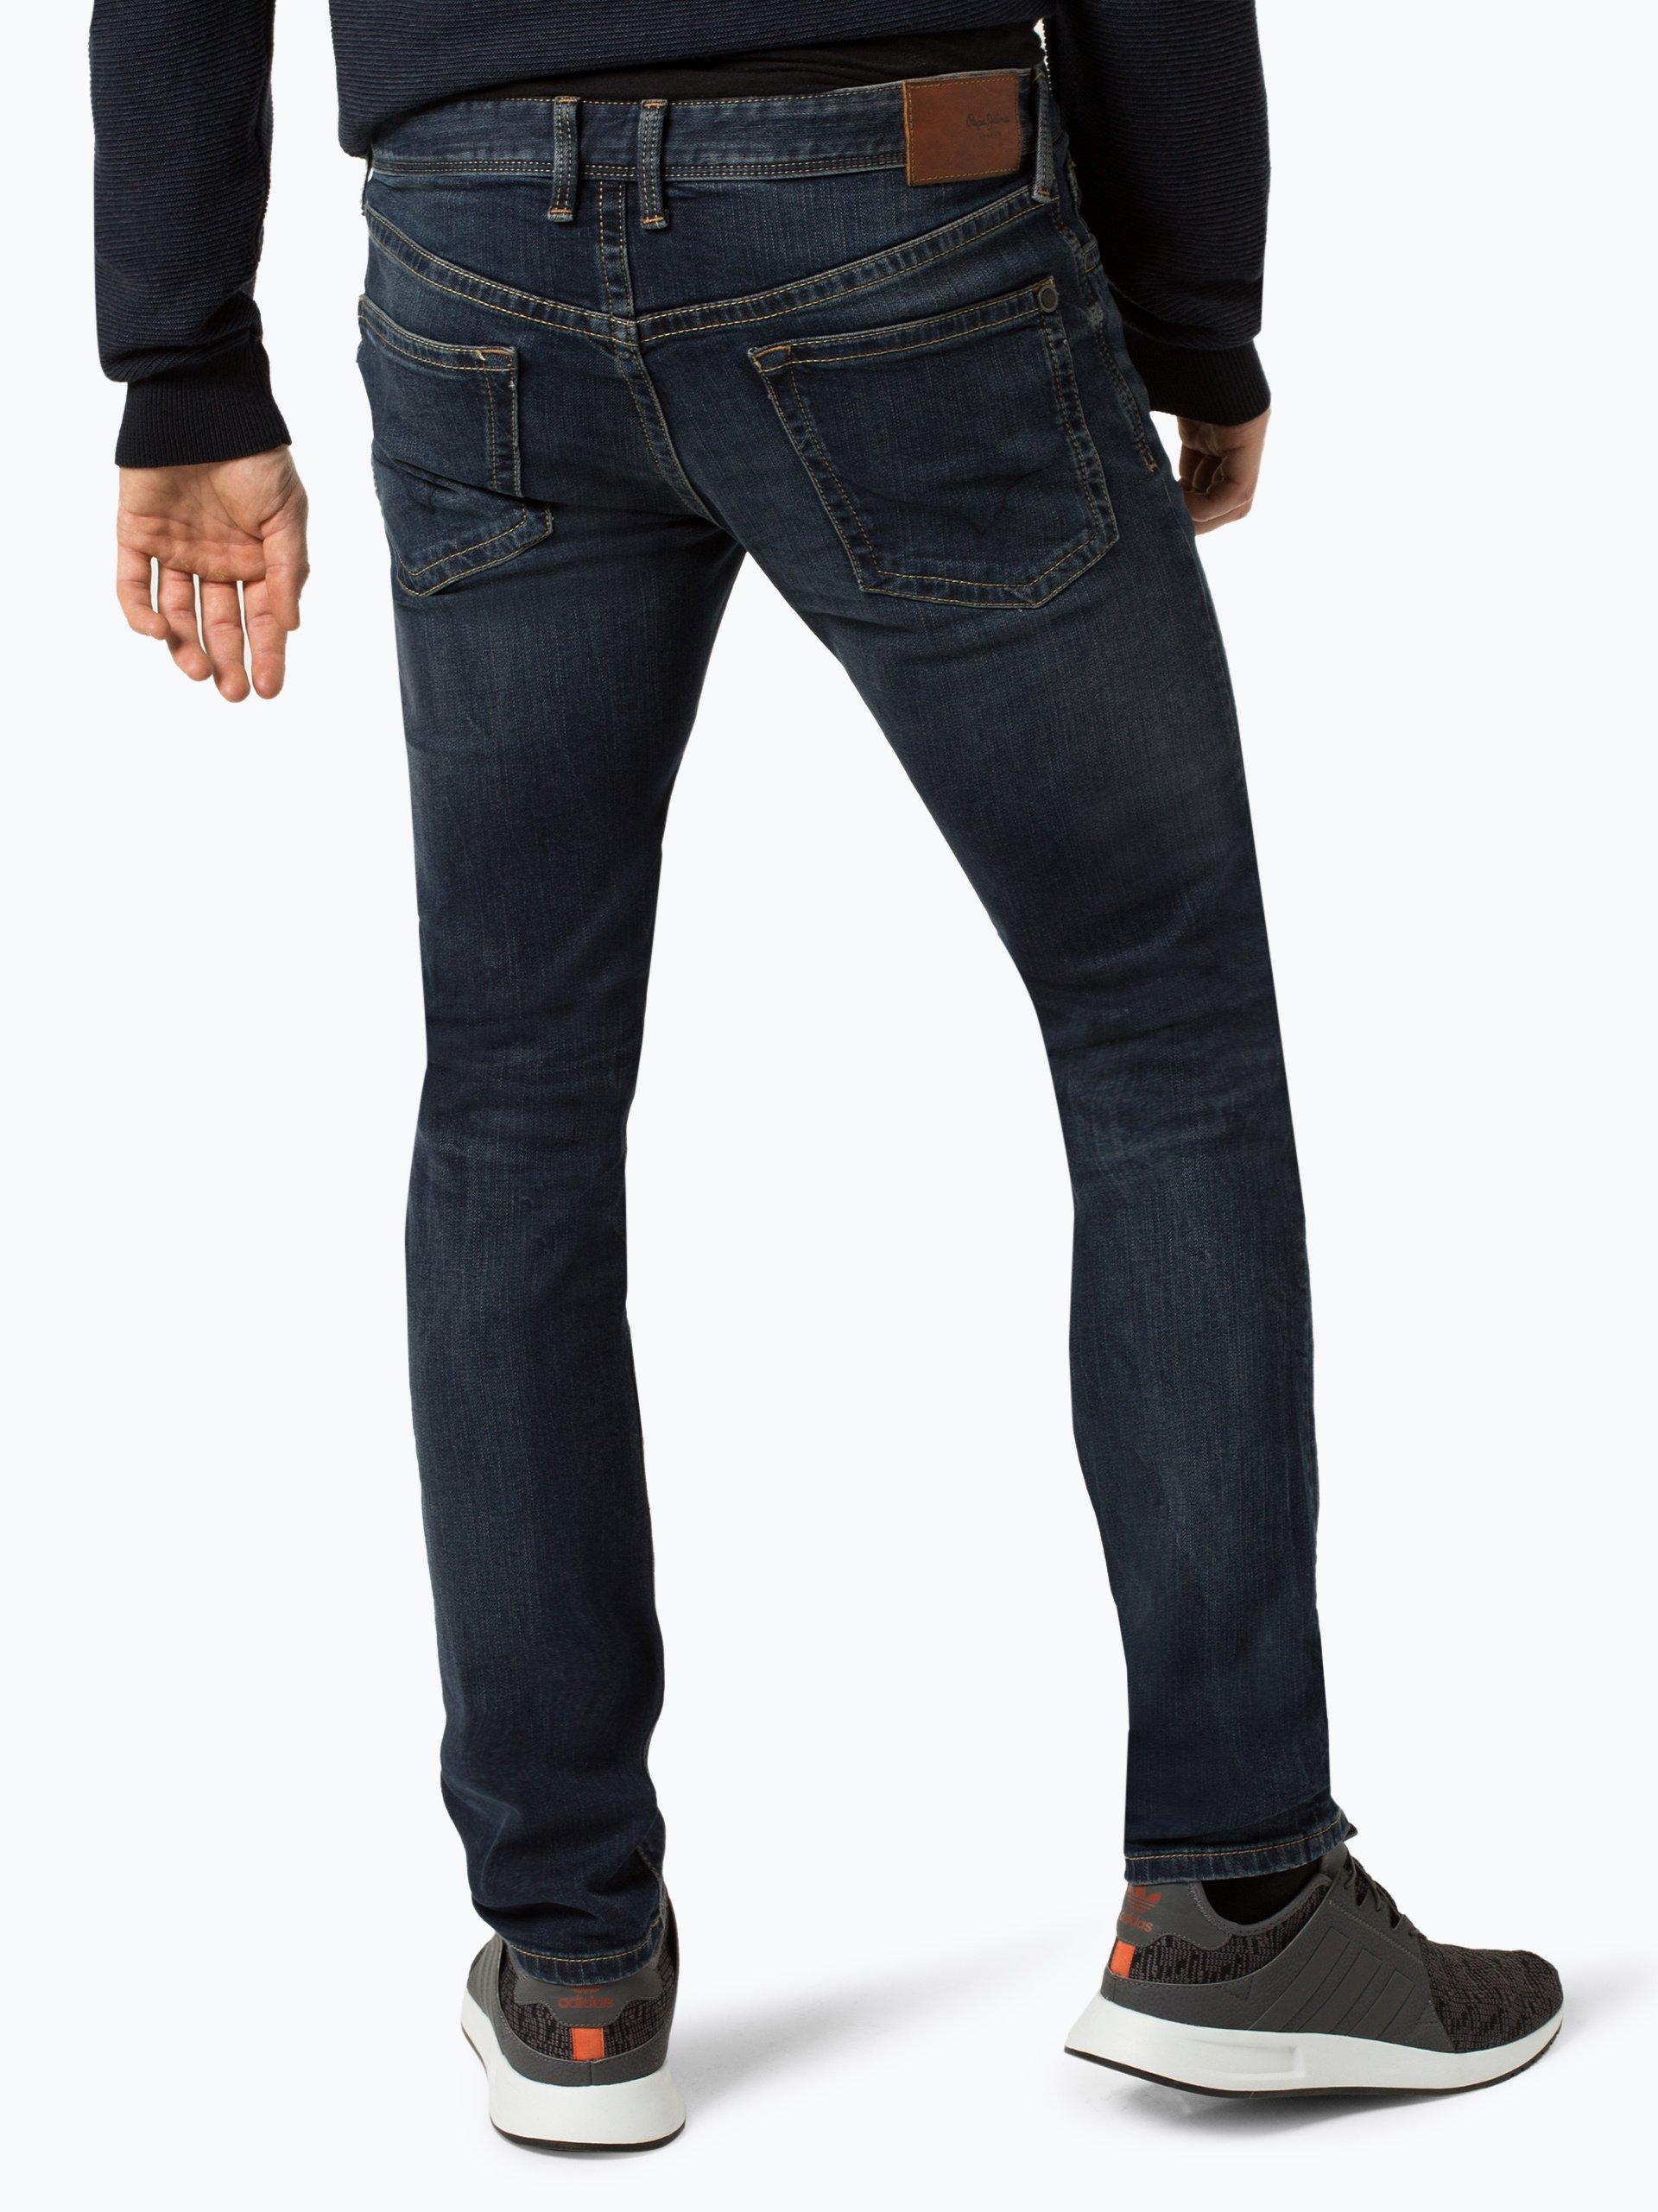 pepe jeans herren jeans hatch online kaufen vangraaf com. Black Bedroom Furniture Sets. Home Design Ideas